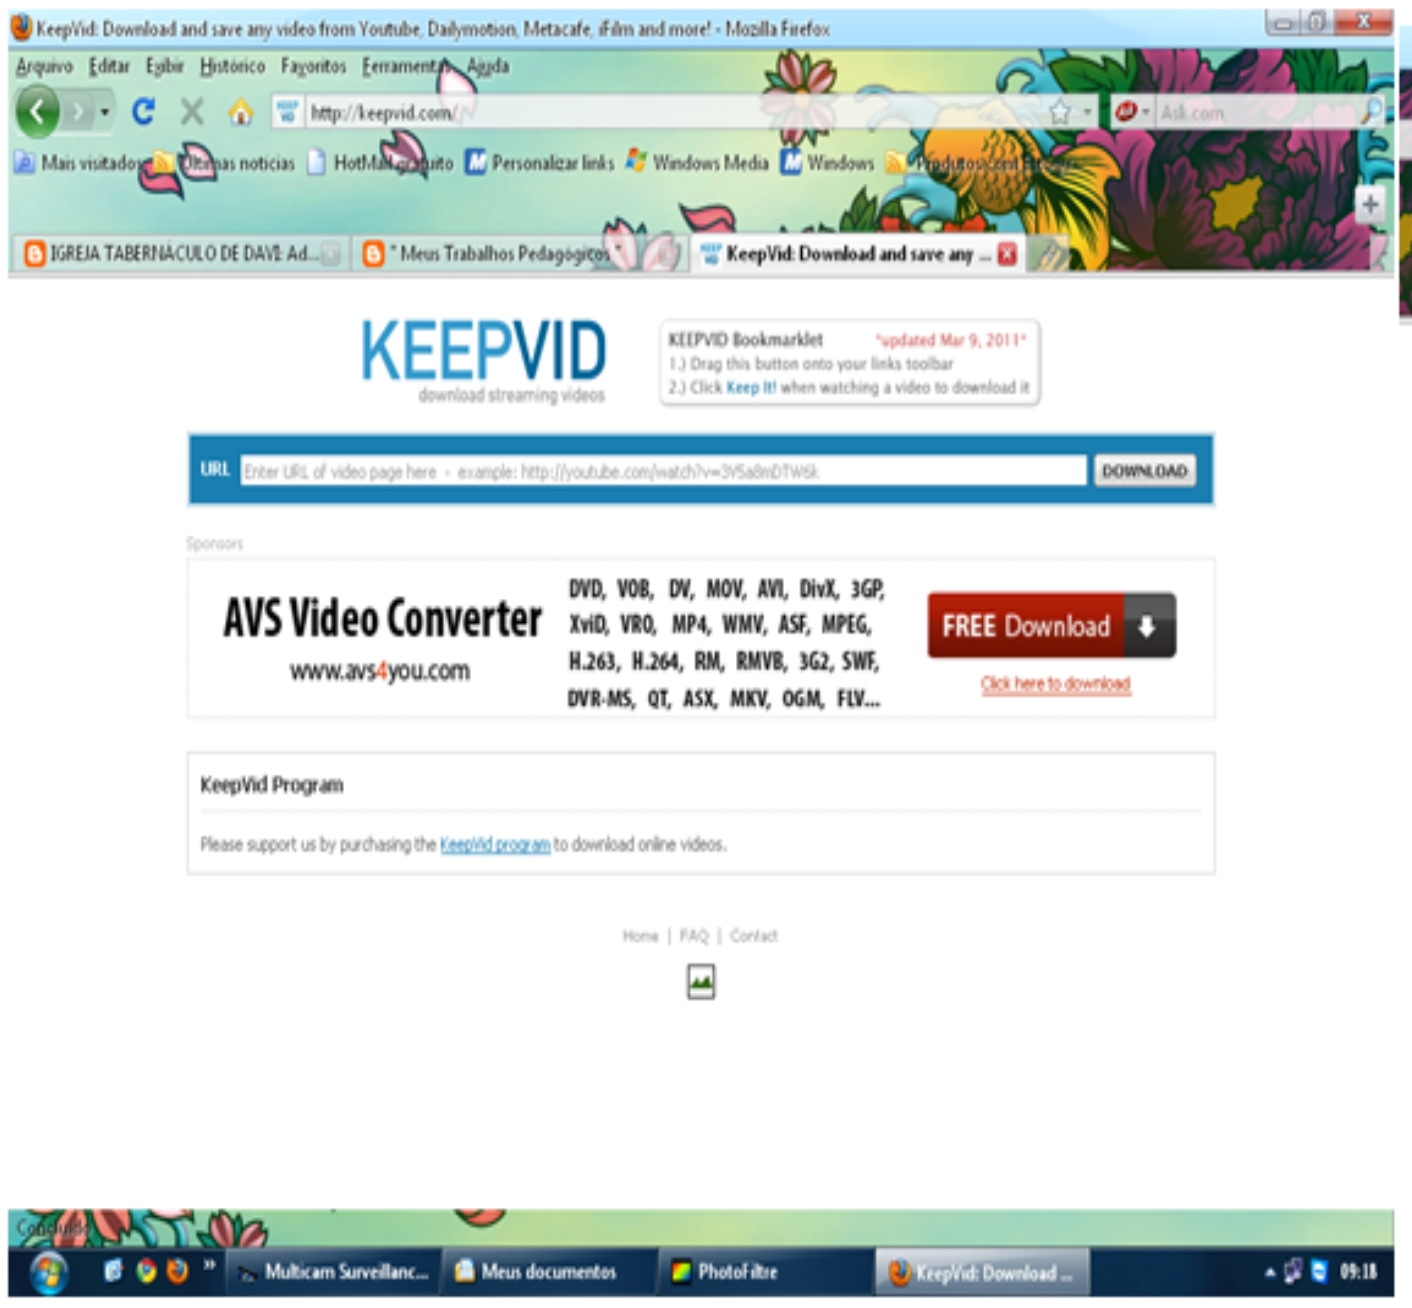 como+baixar+video+no+you+tube+keepvid+1.jpg